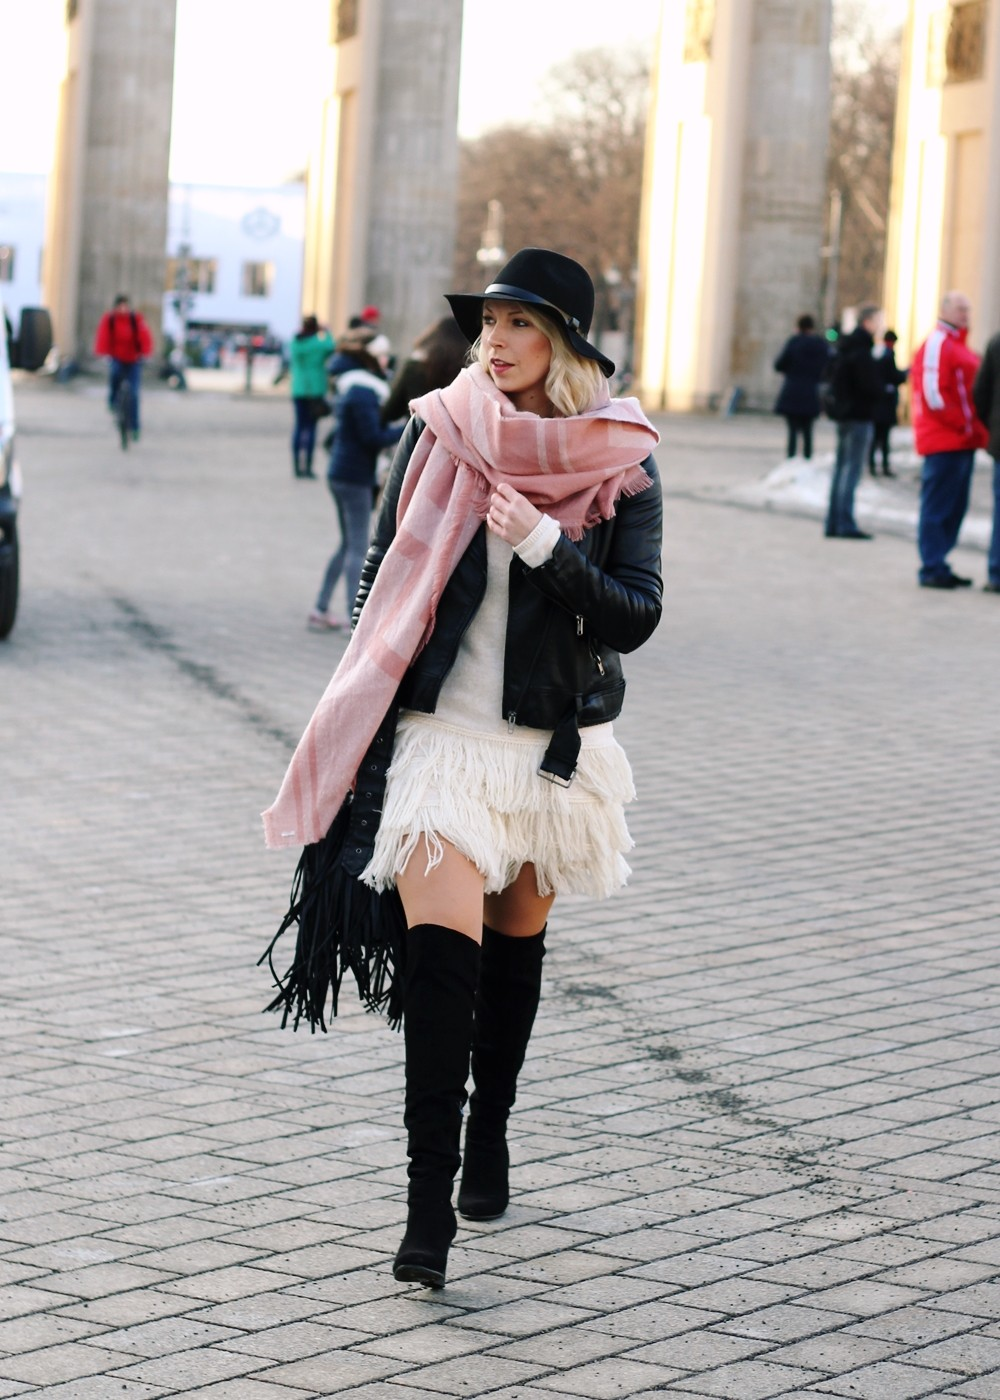 Fashion Week Berlin 2016 Outfit OOTD Fransen Strickkleid Lederjacke Overknees Schal Hut Fransentasche 8